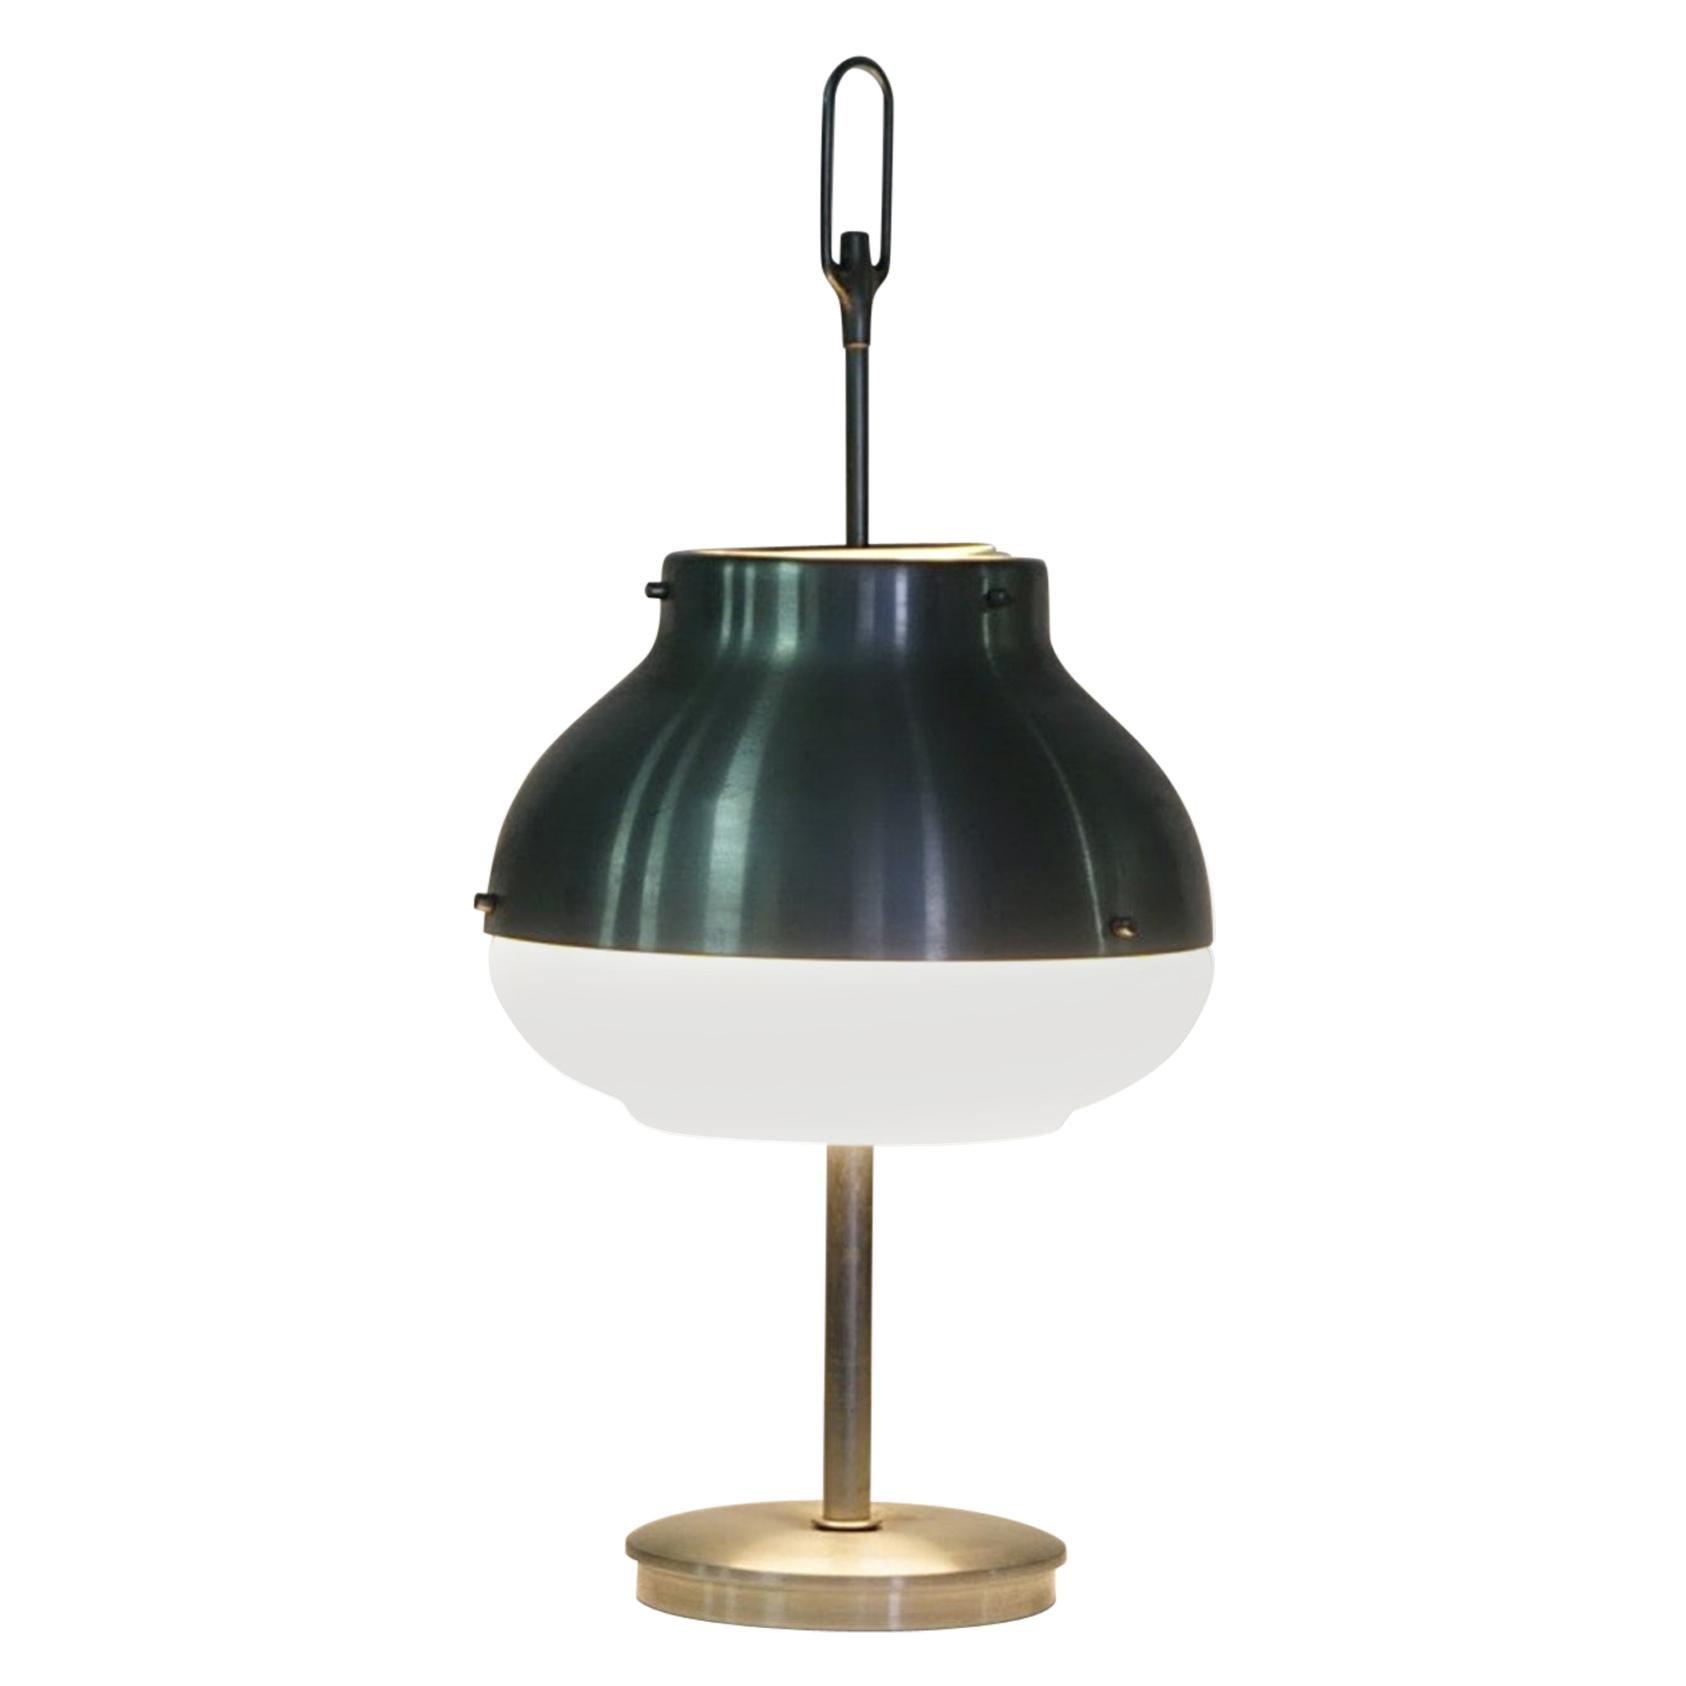 Table Lamp by Oscar Torlasco, Lumi, Italy, 1960